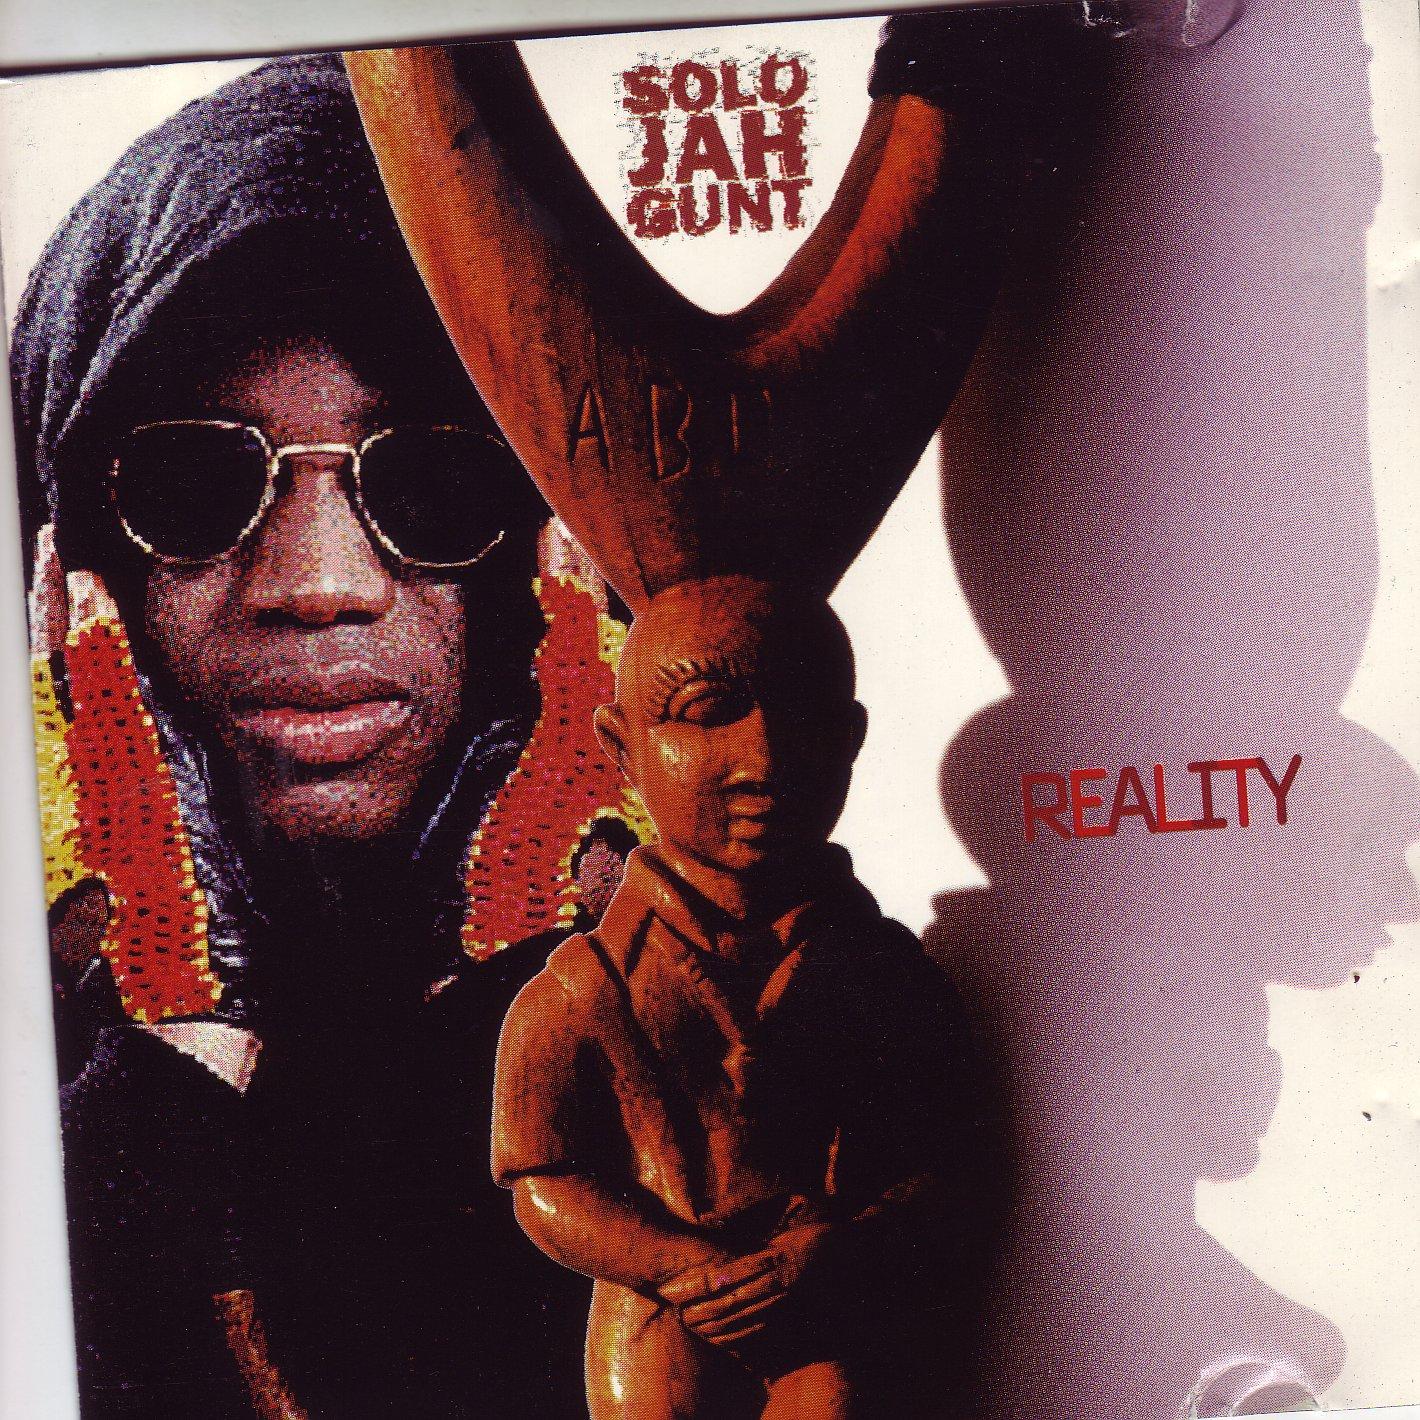 1995 - LP Solo Jah Gunt